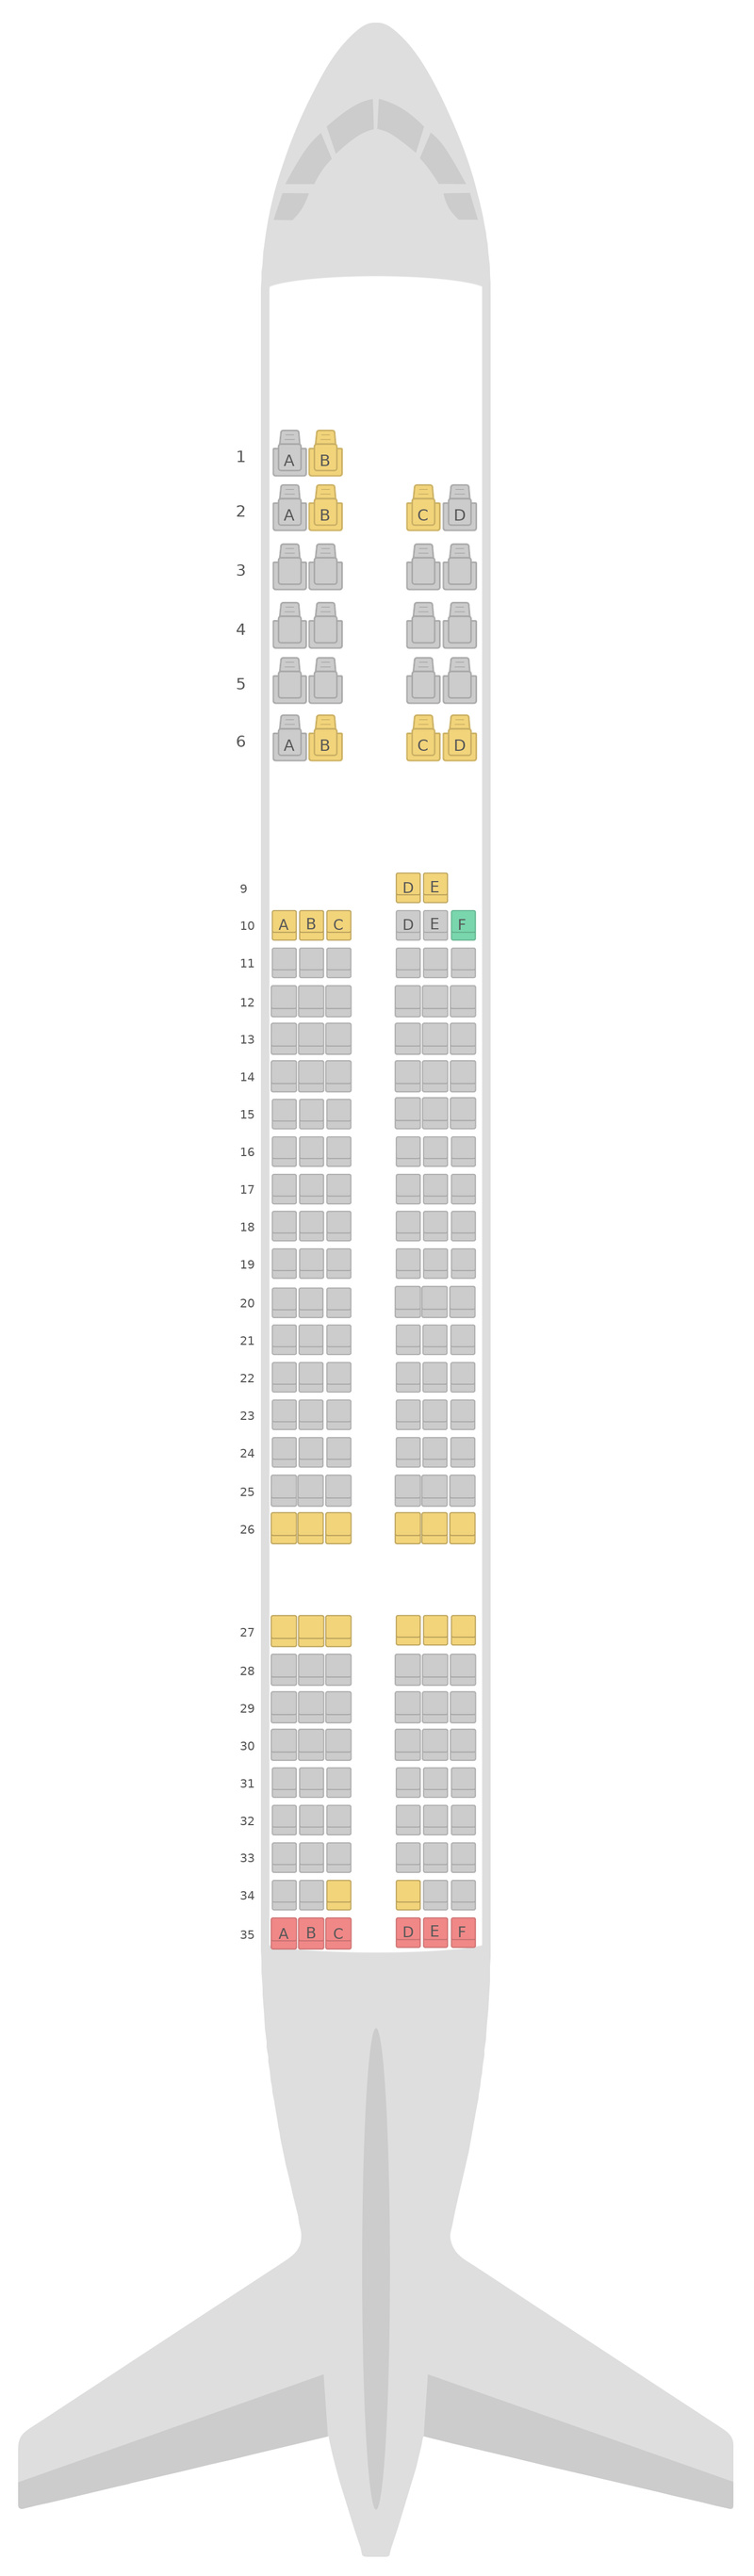 Mapa de asientos Boeing 757-200 (752) Azerbaijan Airlines